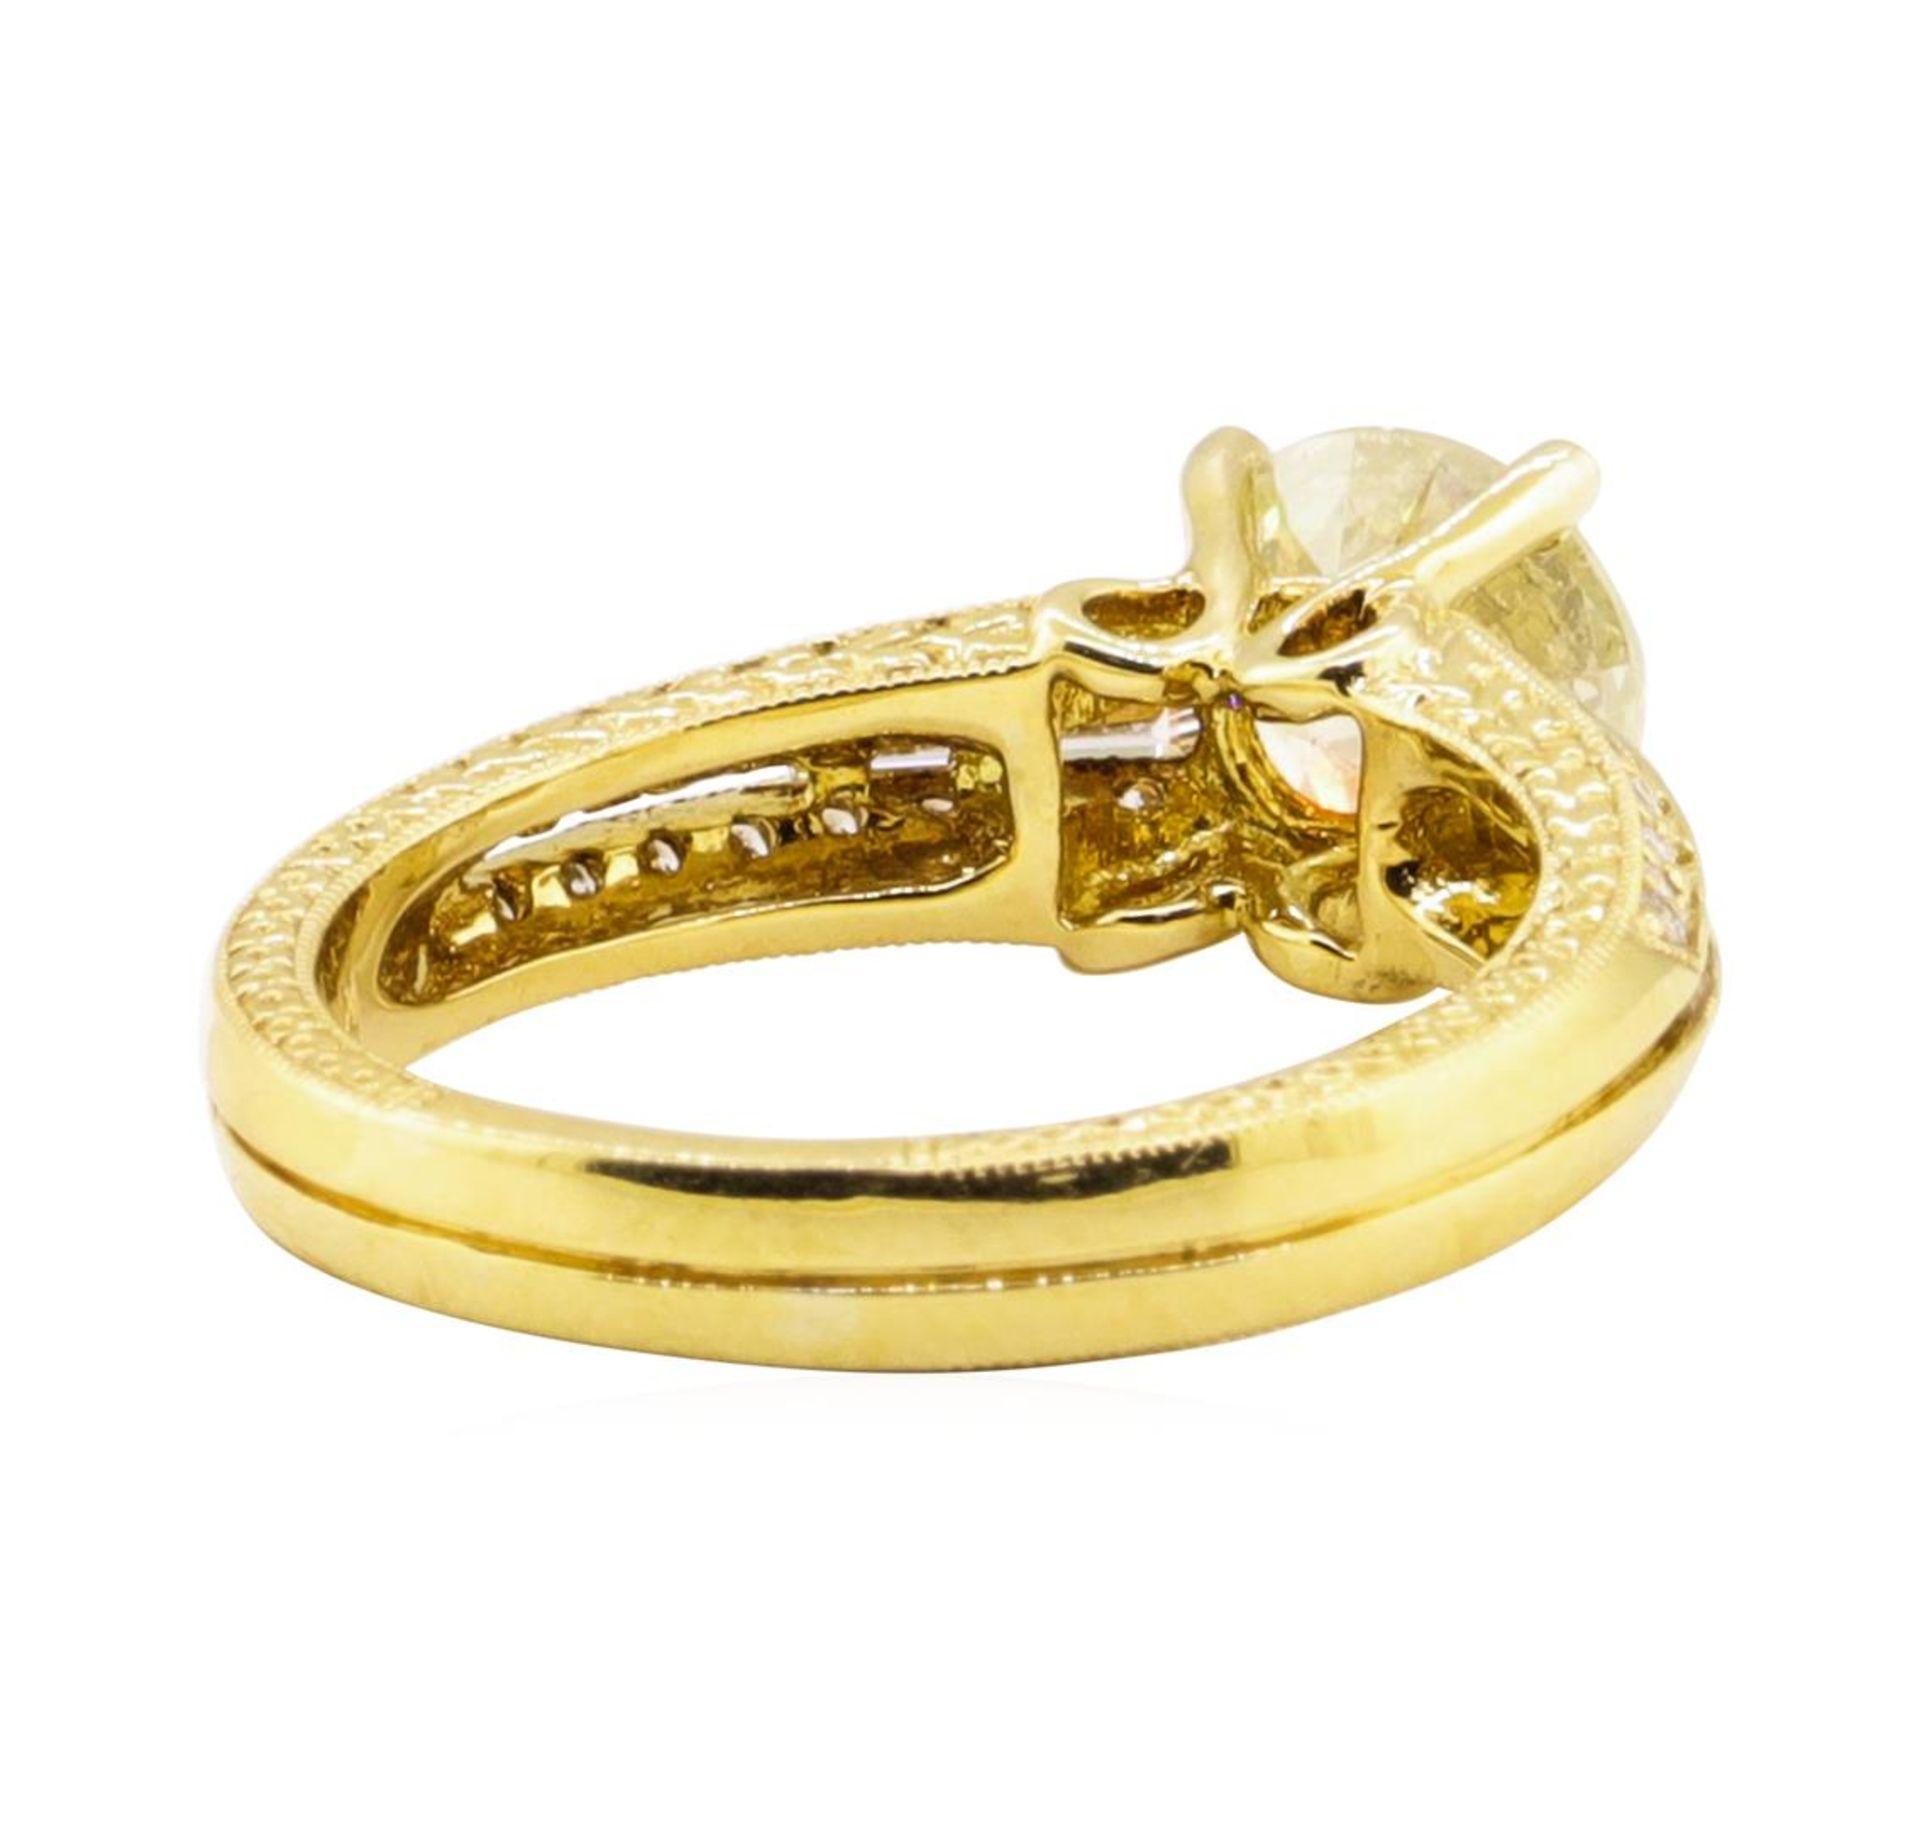 1.67ct Diamond Ring - 18KT Yellow Gold - Image 3 of 5